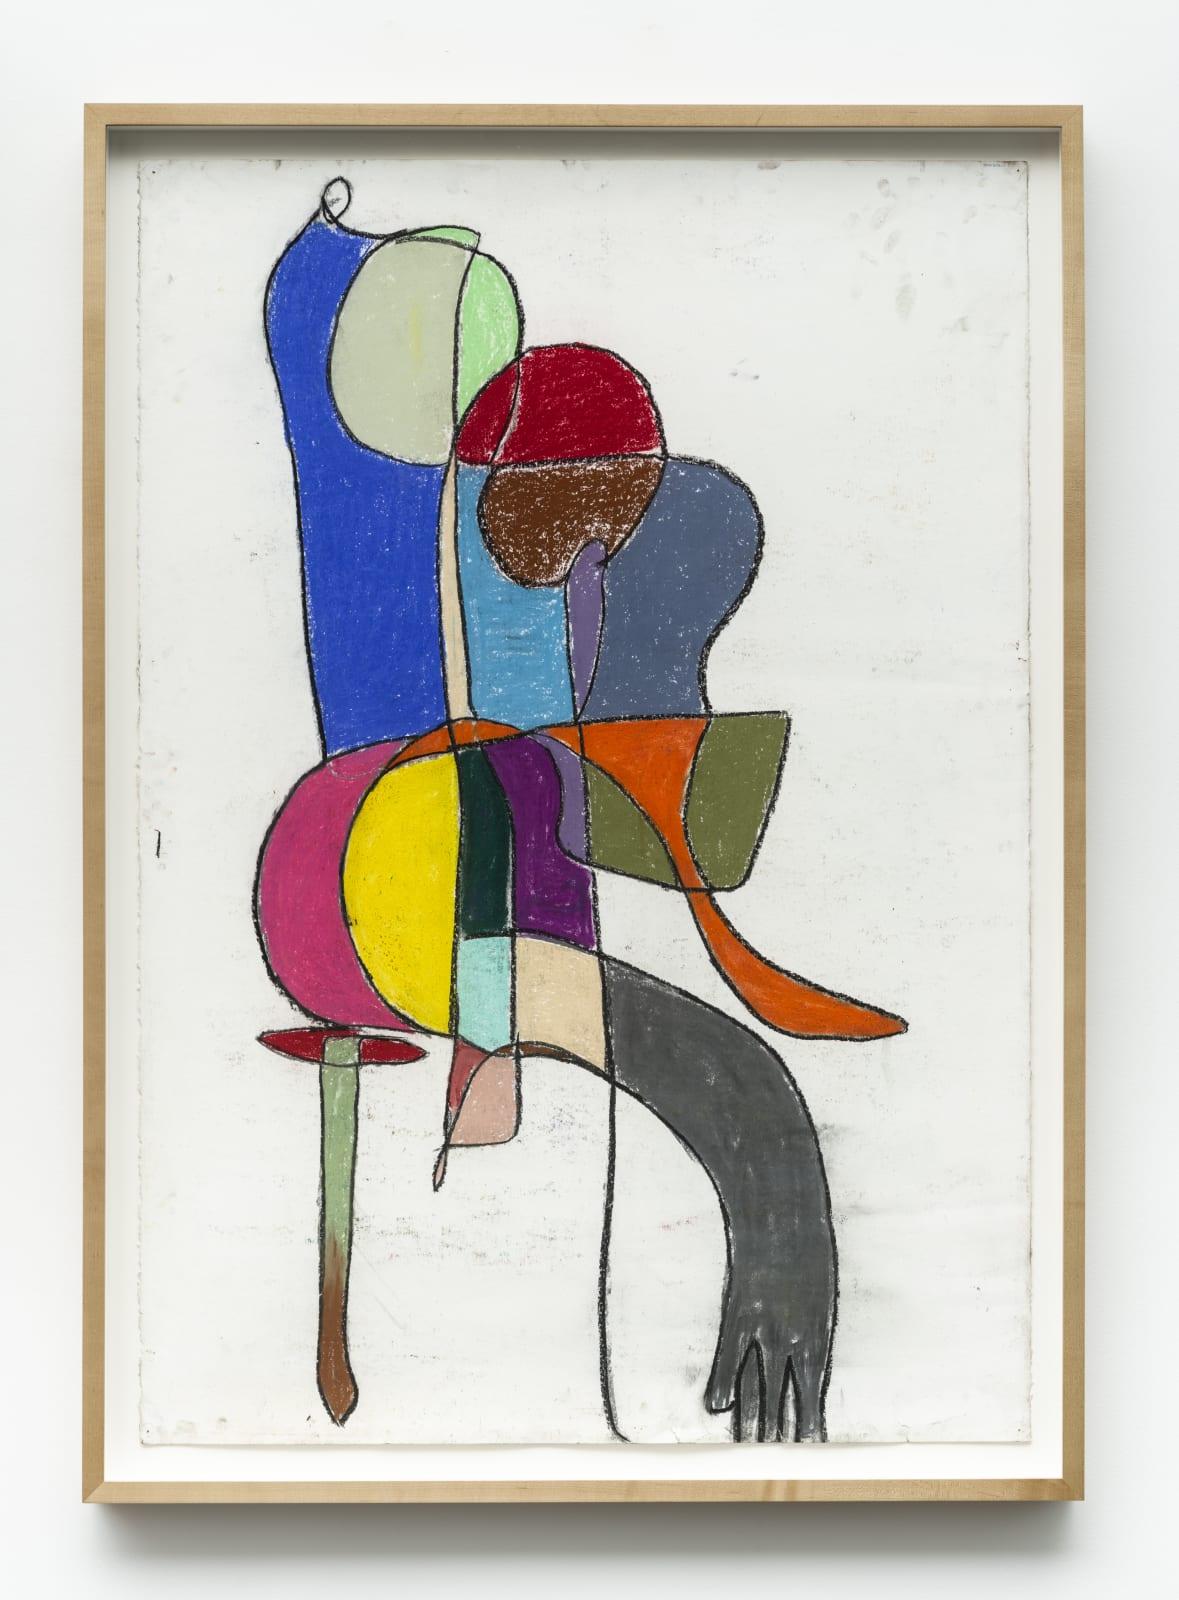 Serge Attukwei Clottey, Into conversation, 2018 , 2018